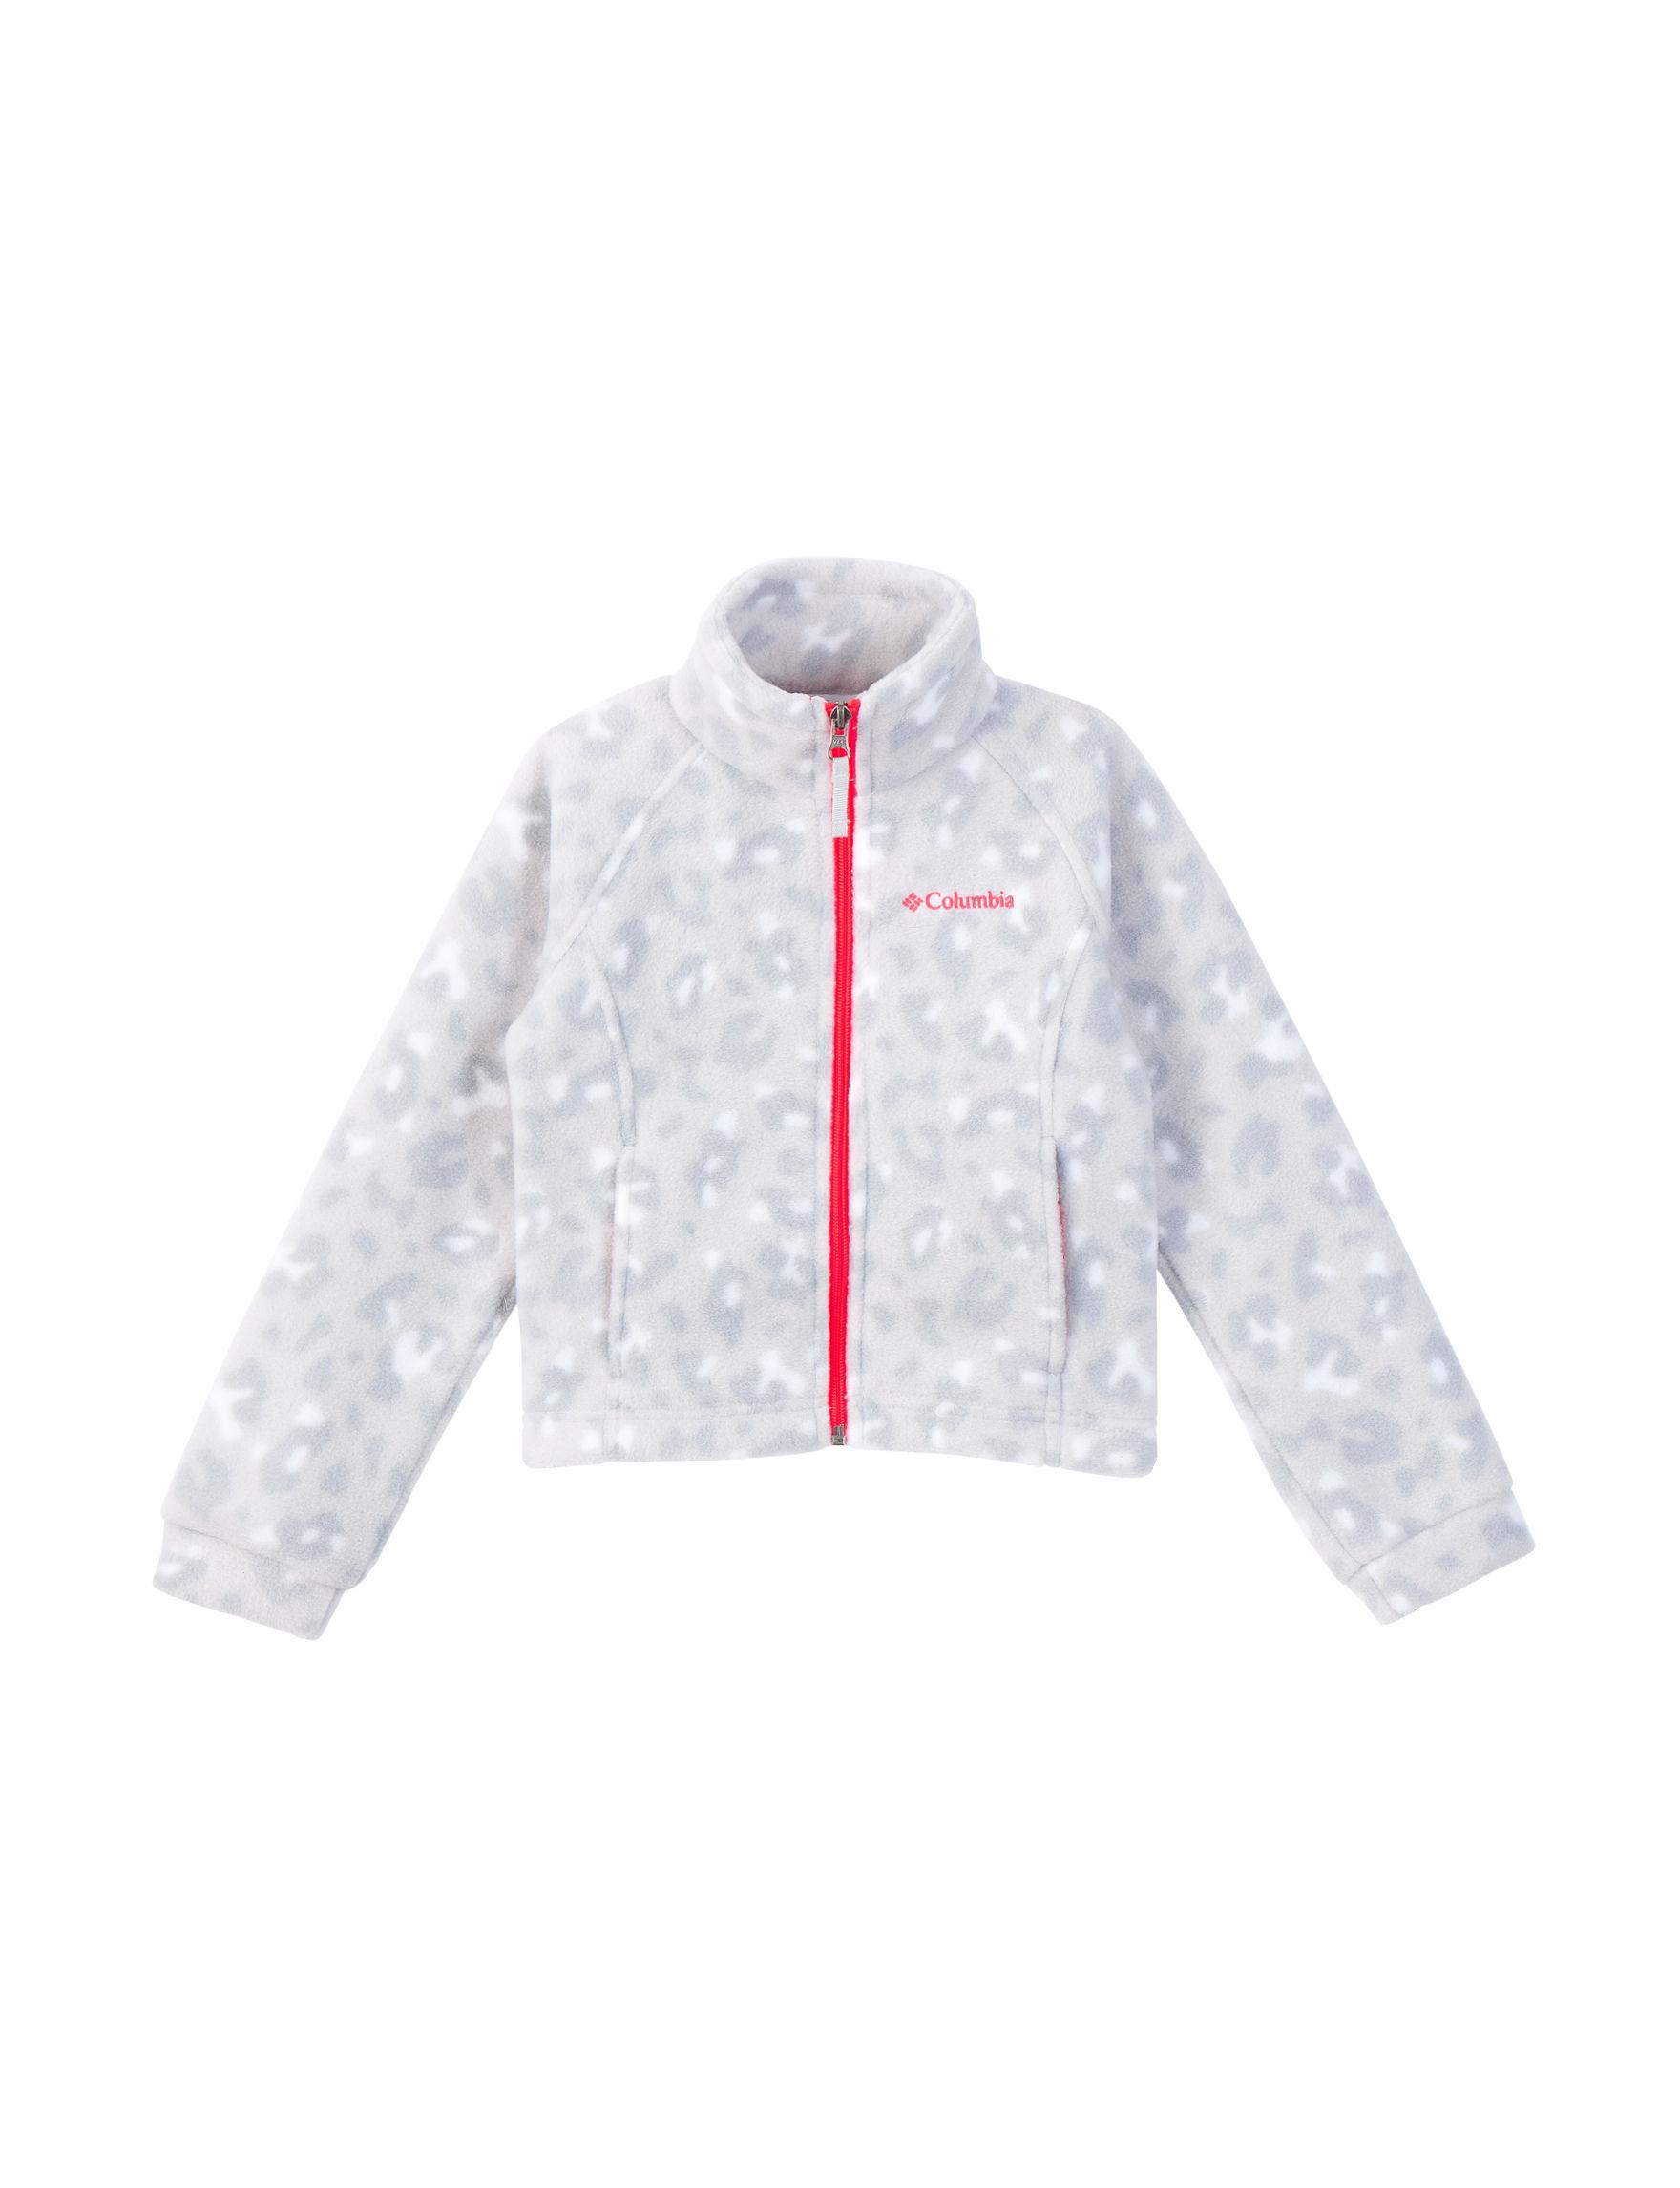 Columbia  Fleece & Soft Shell Jackets